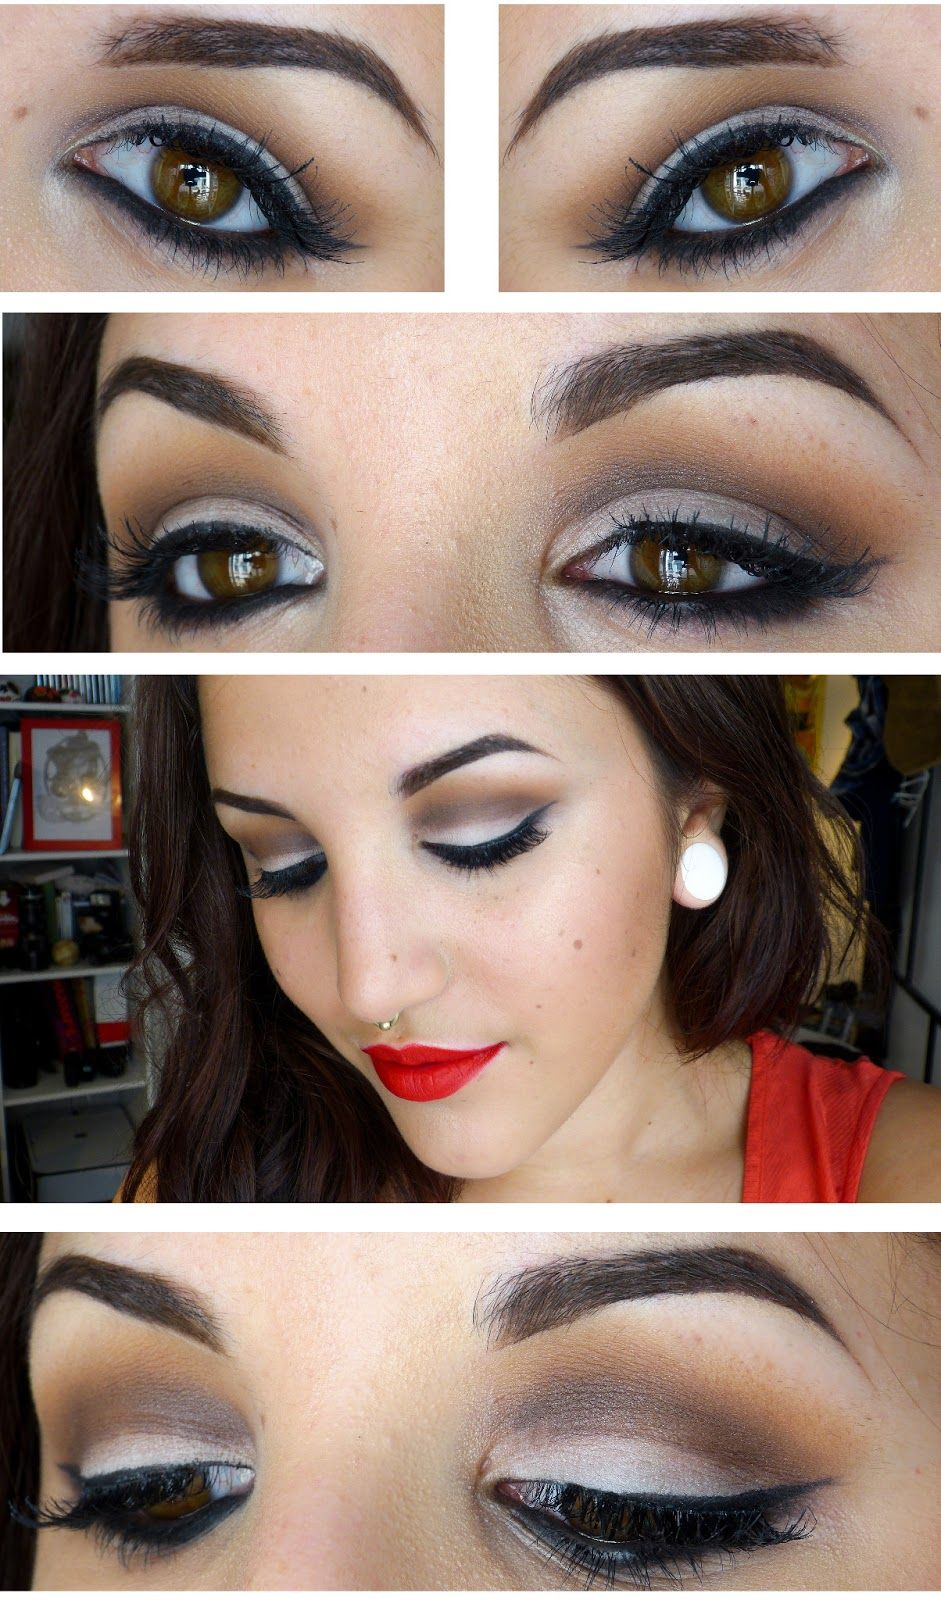 Pin on Make-up Magic